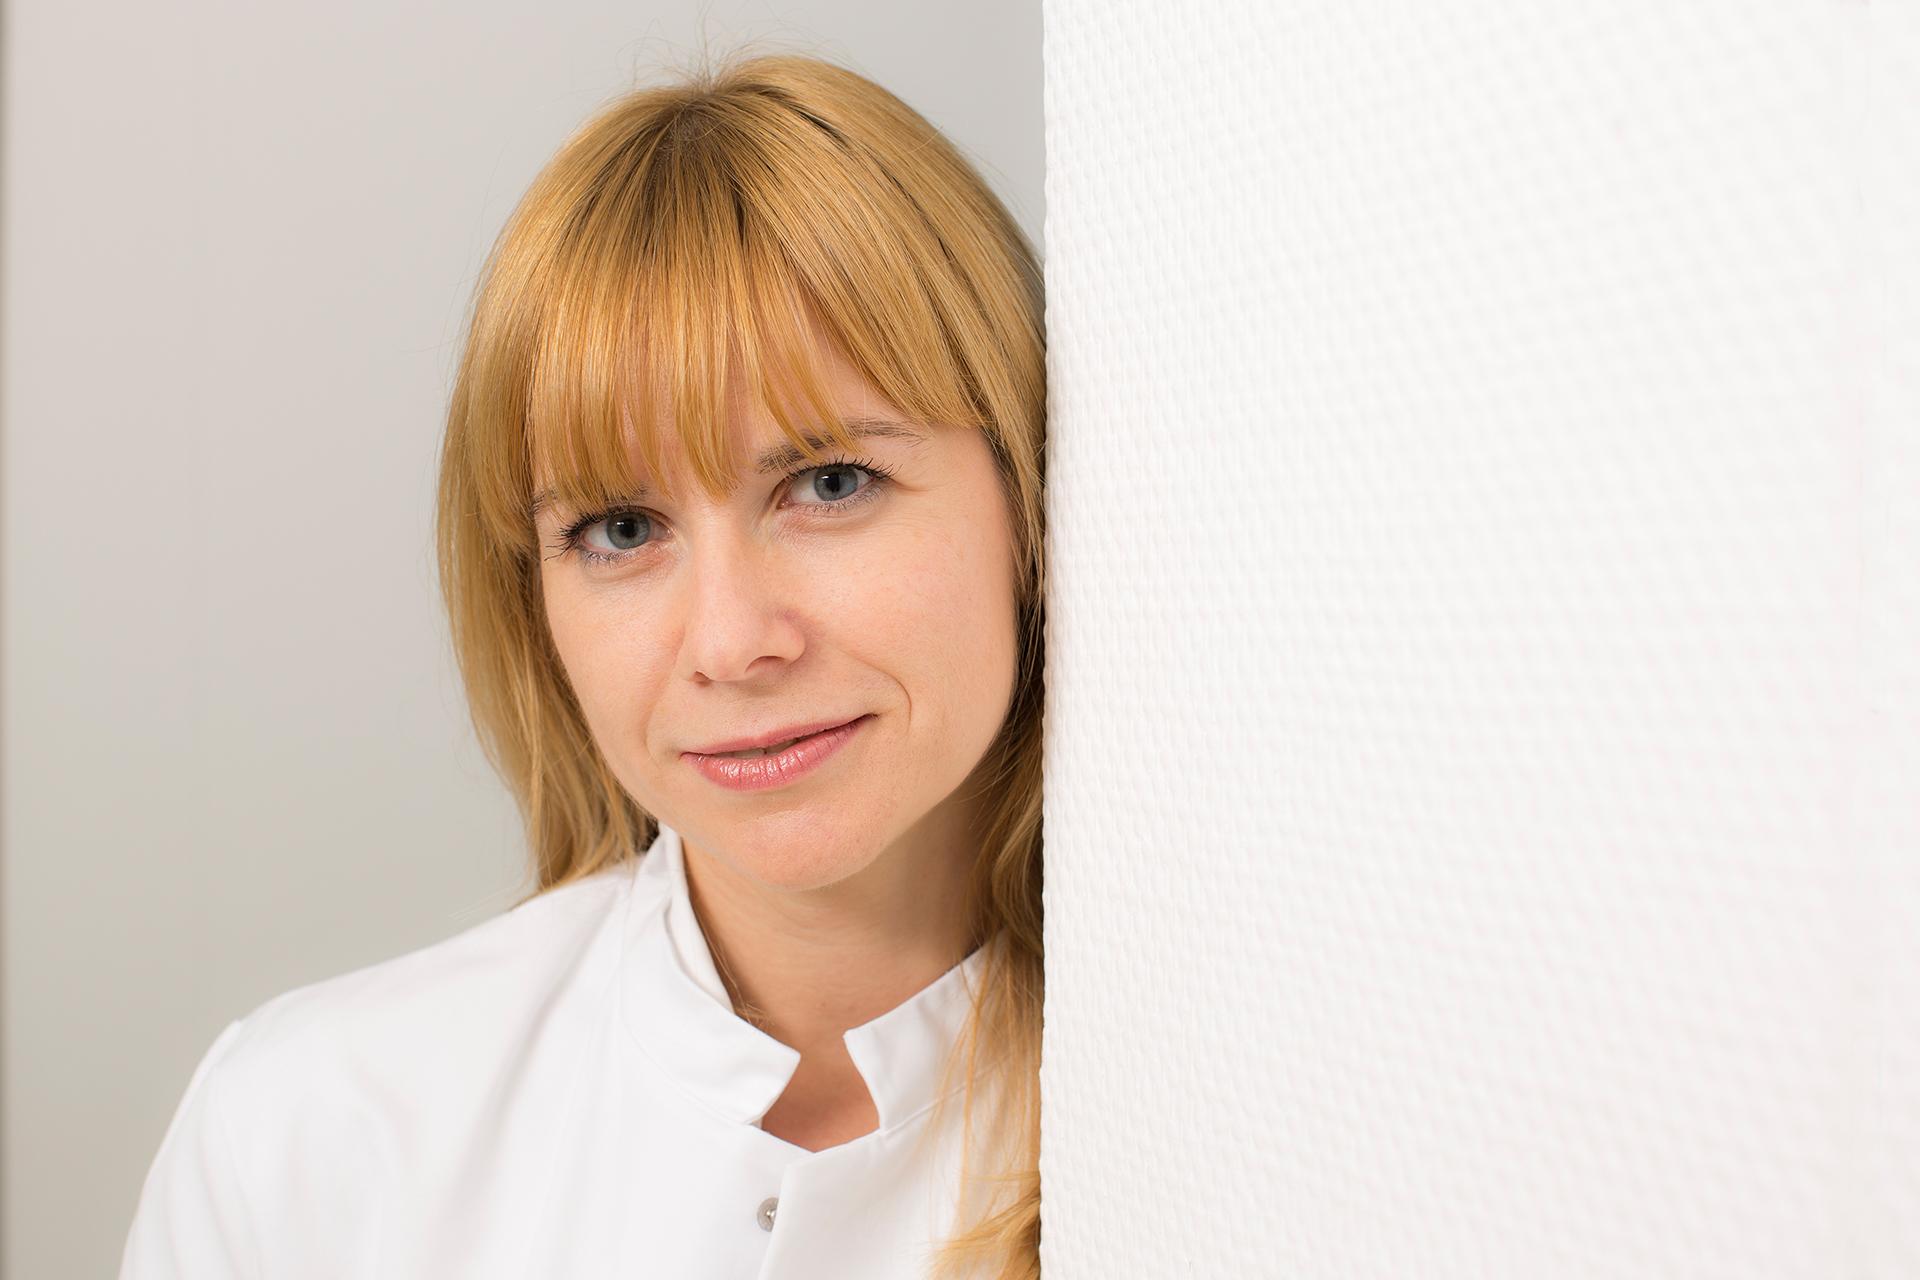 Krankenhaus Wermelskirchen GmbH - Medizin. Gynäkologie. Ansprechpartner